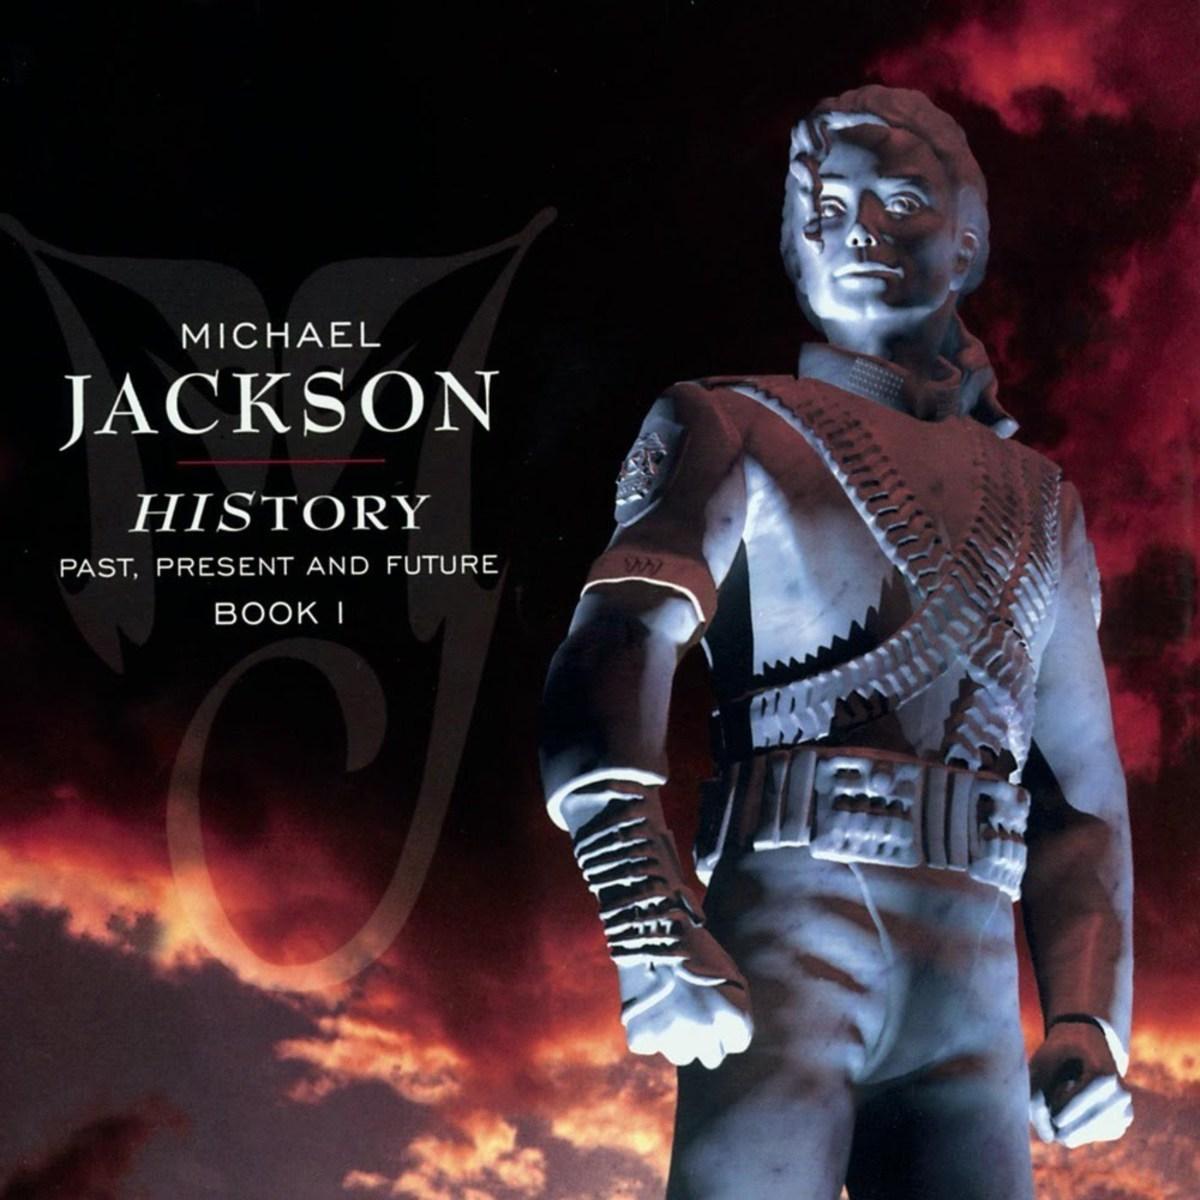 Michael Jackson History Album Cover